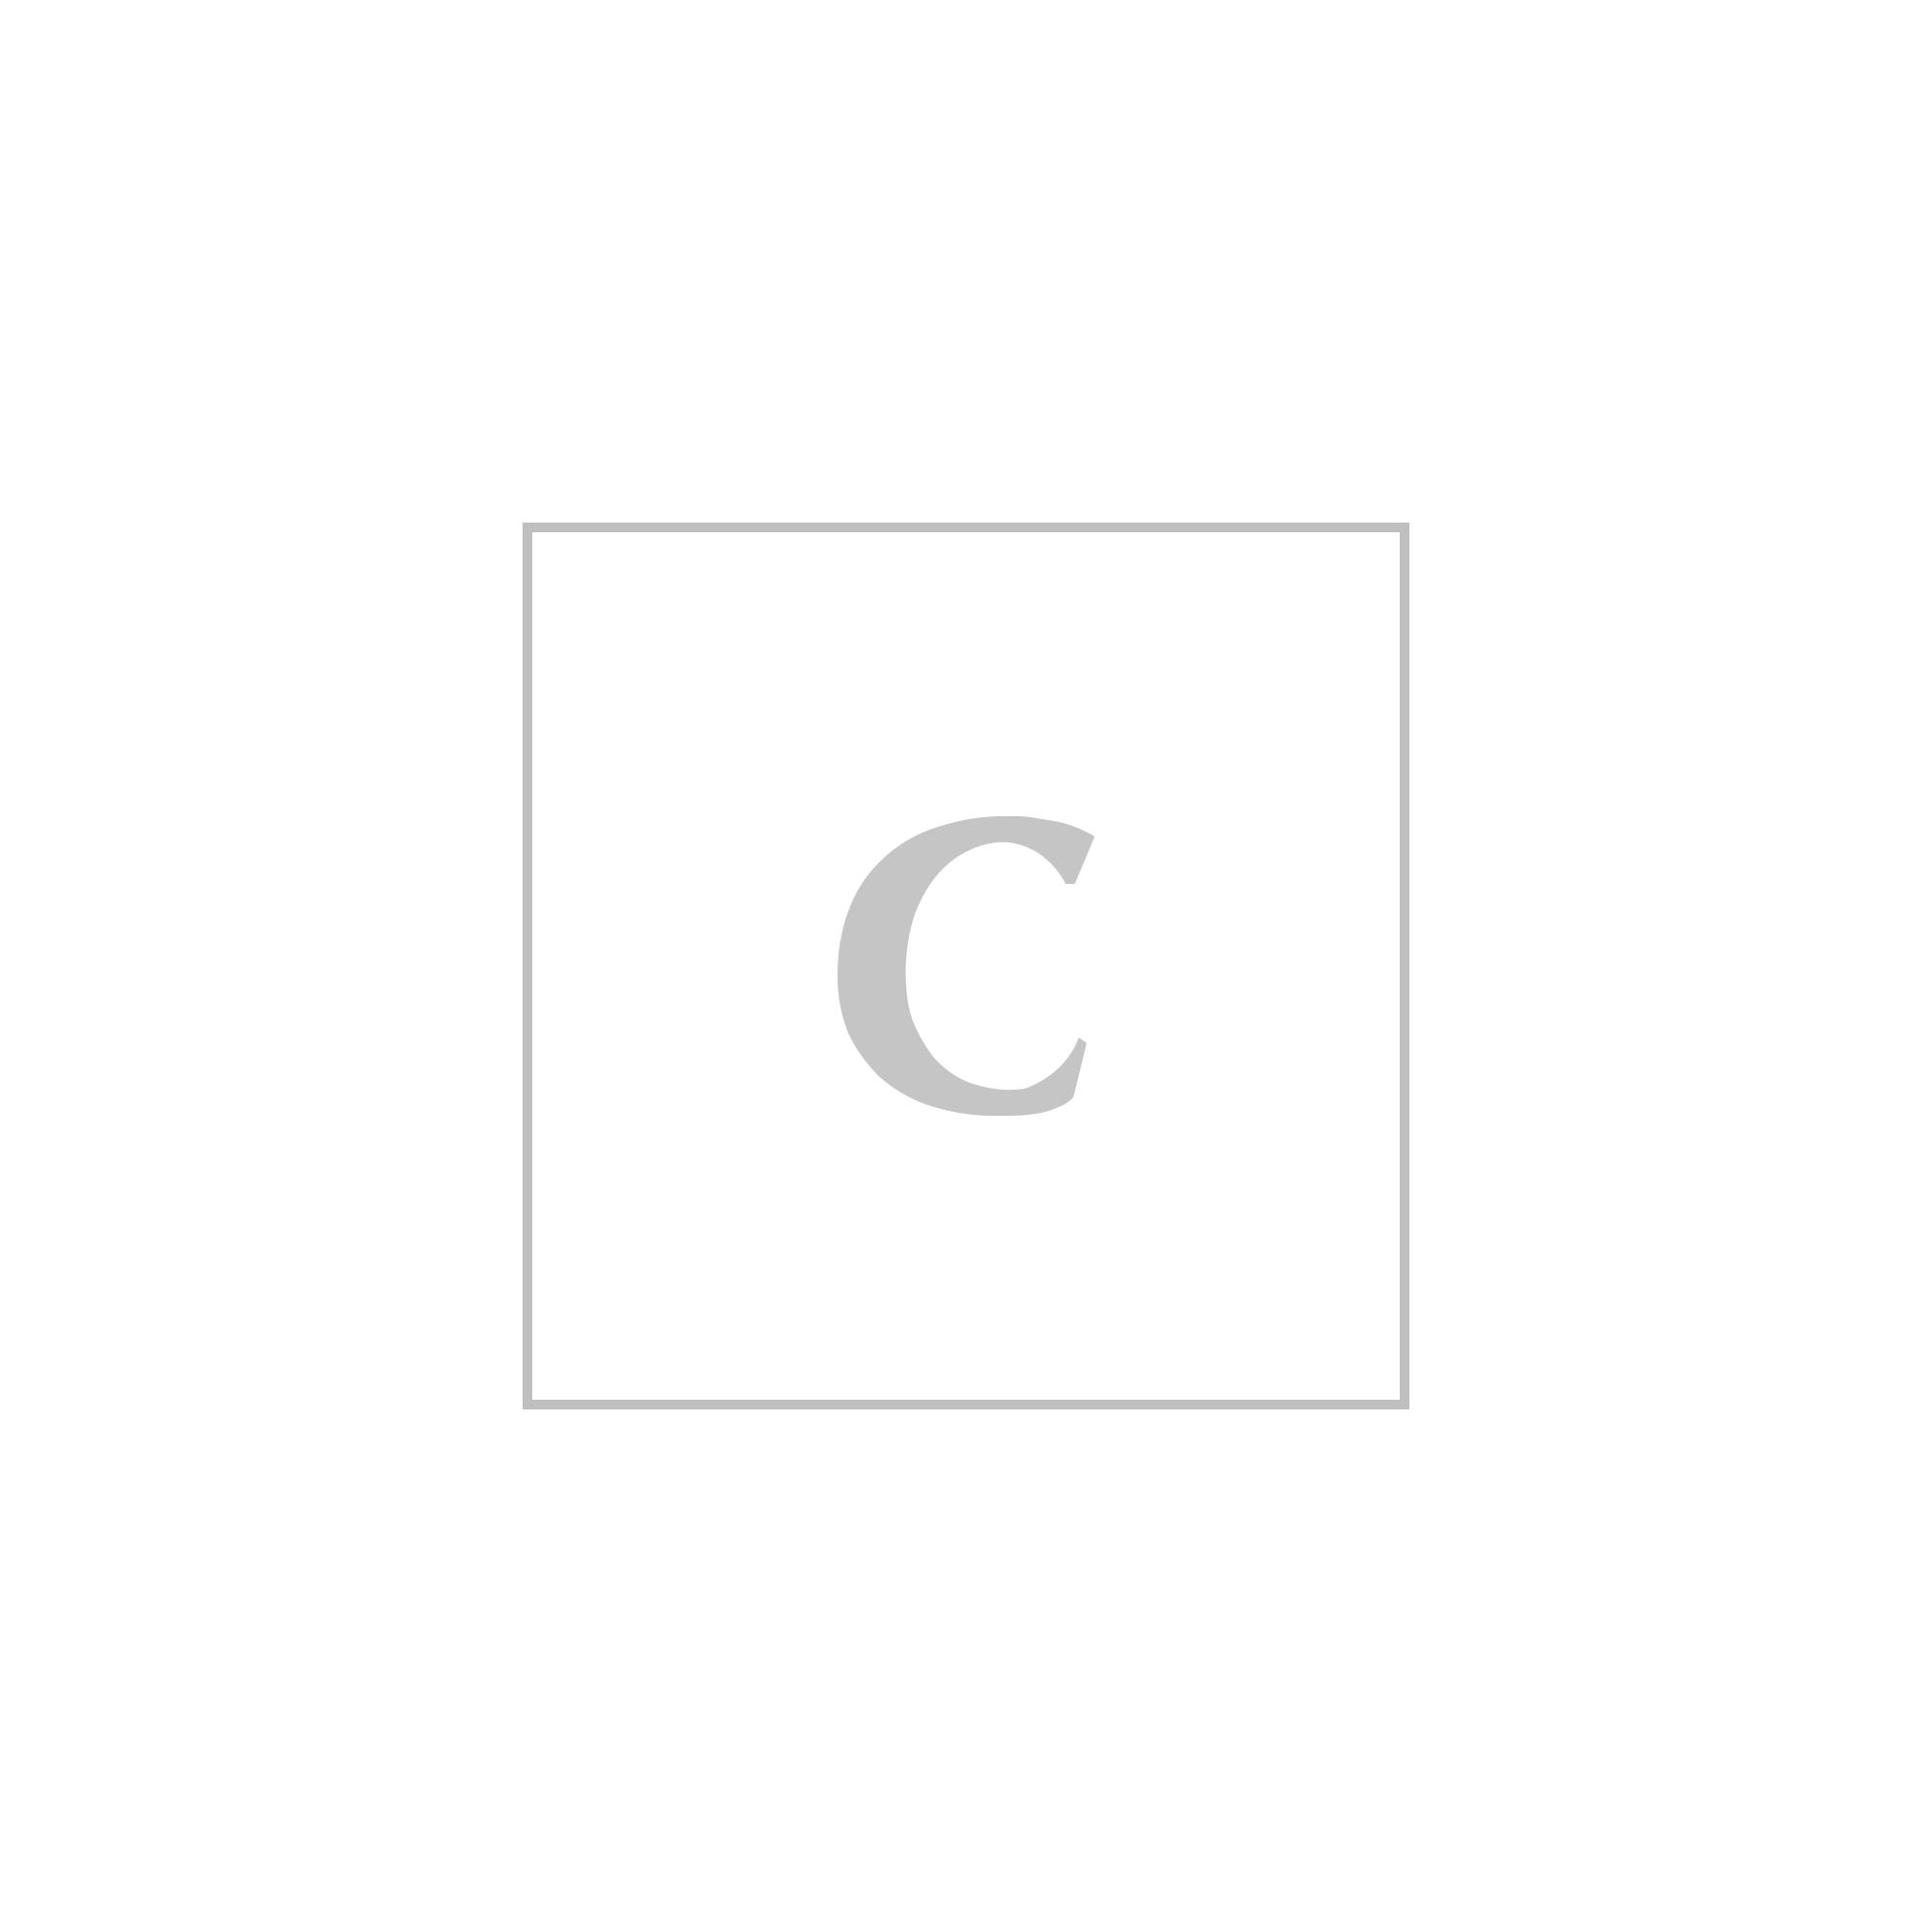 Moncler grenoble giubbotto cailly